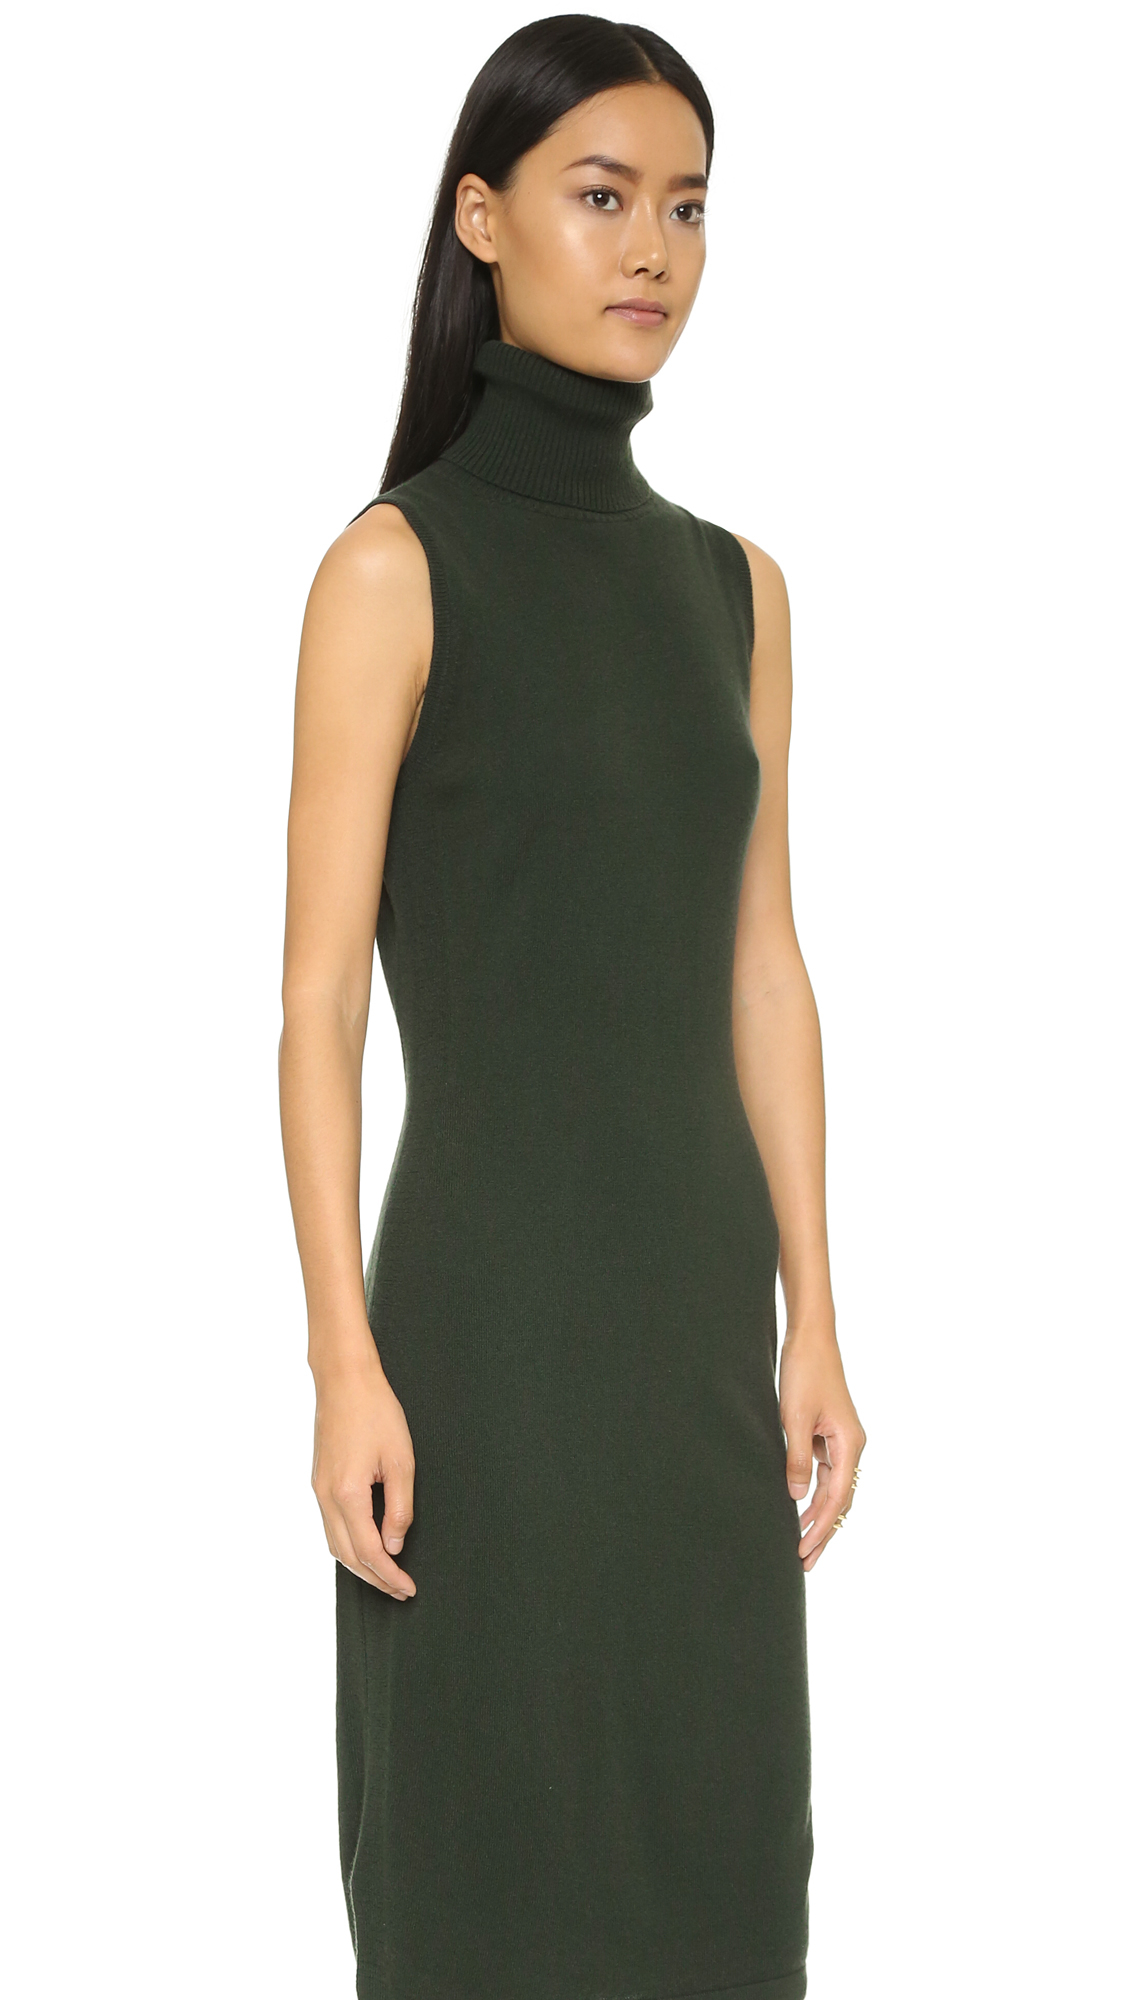 70172ed2af3c27 Lyst Autumn Cashmere Sleeveless Turtleneck Dress Kale In Green